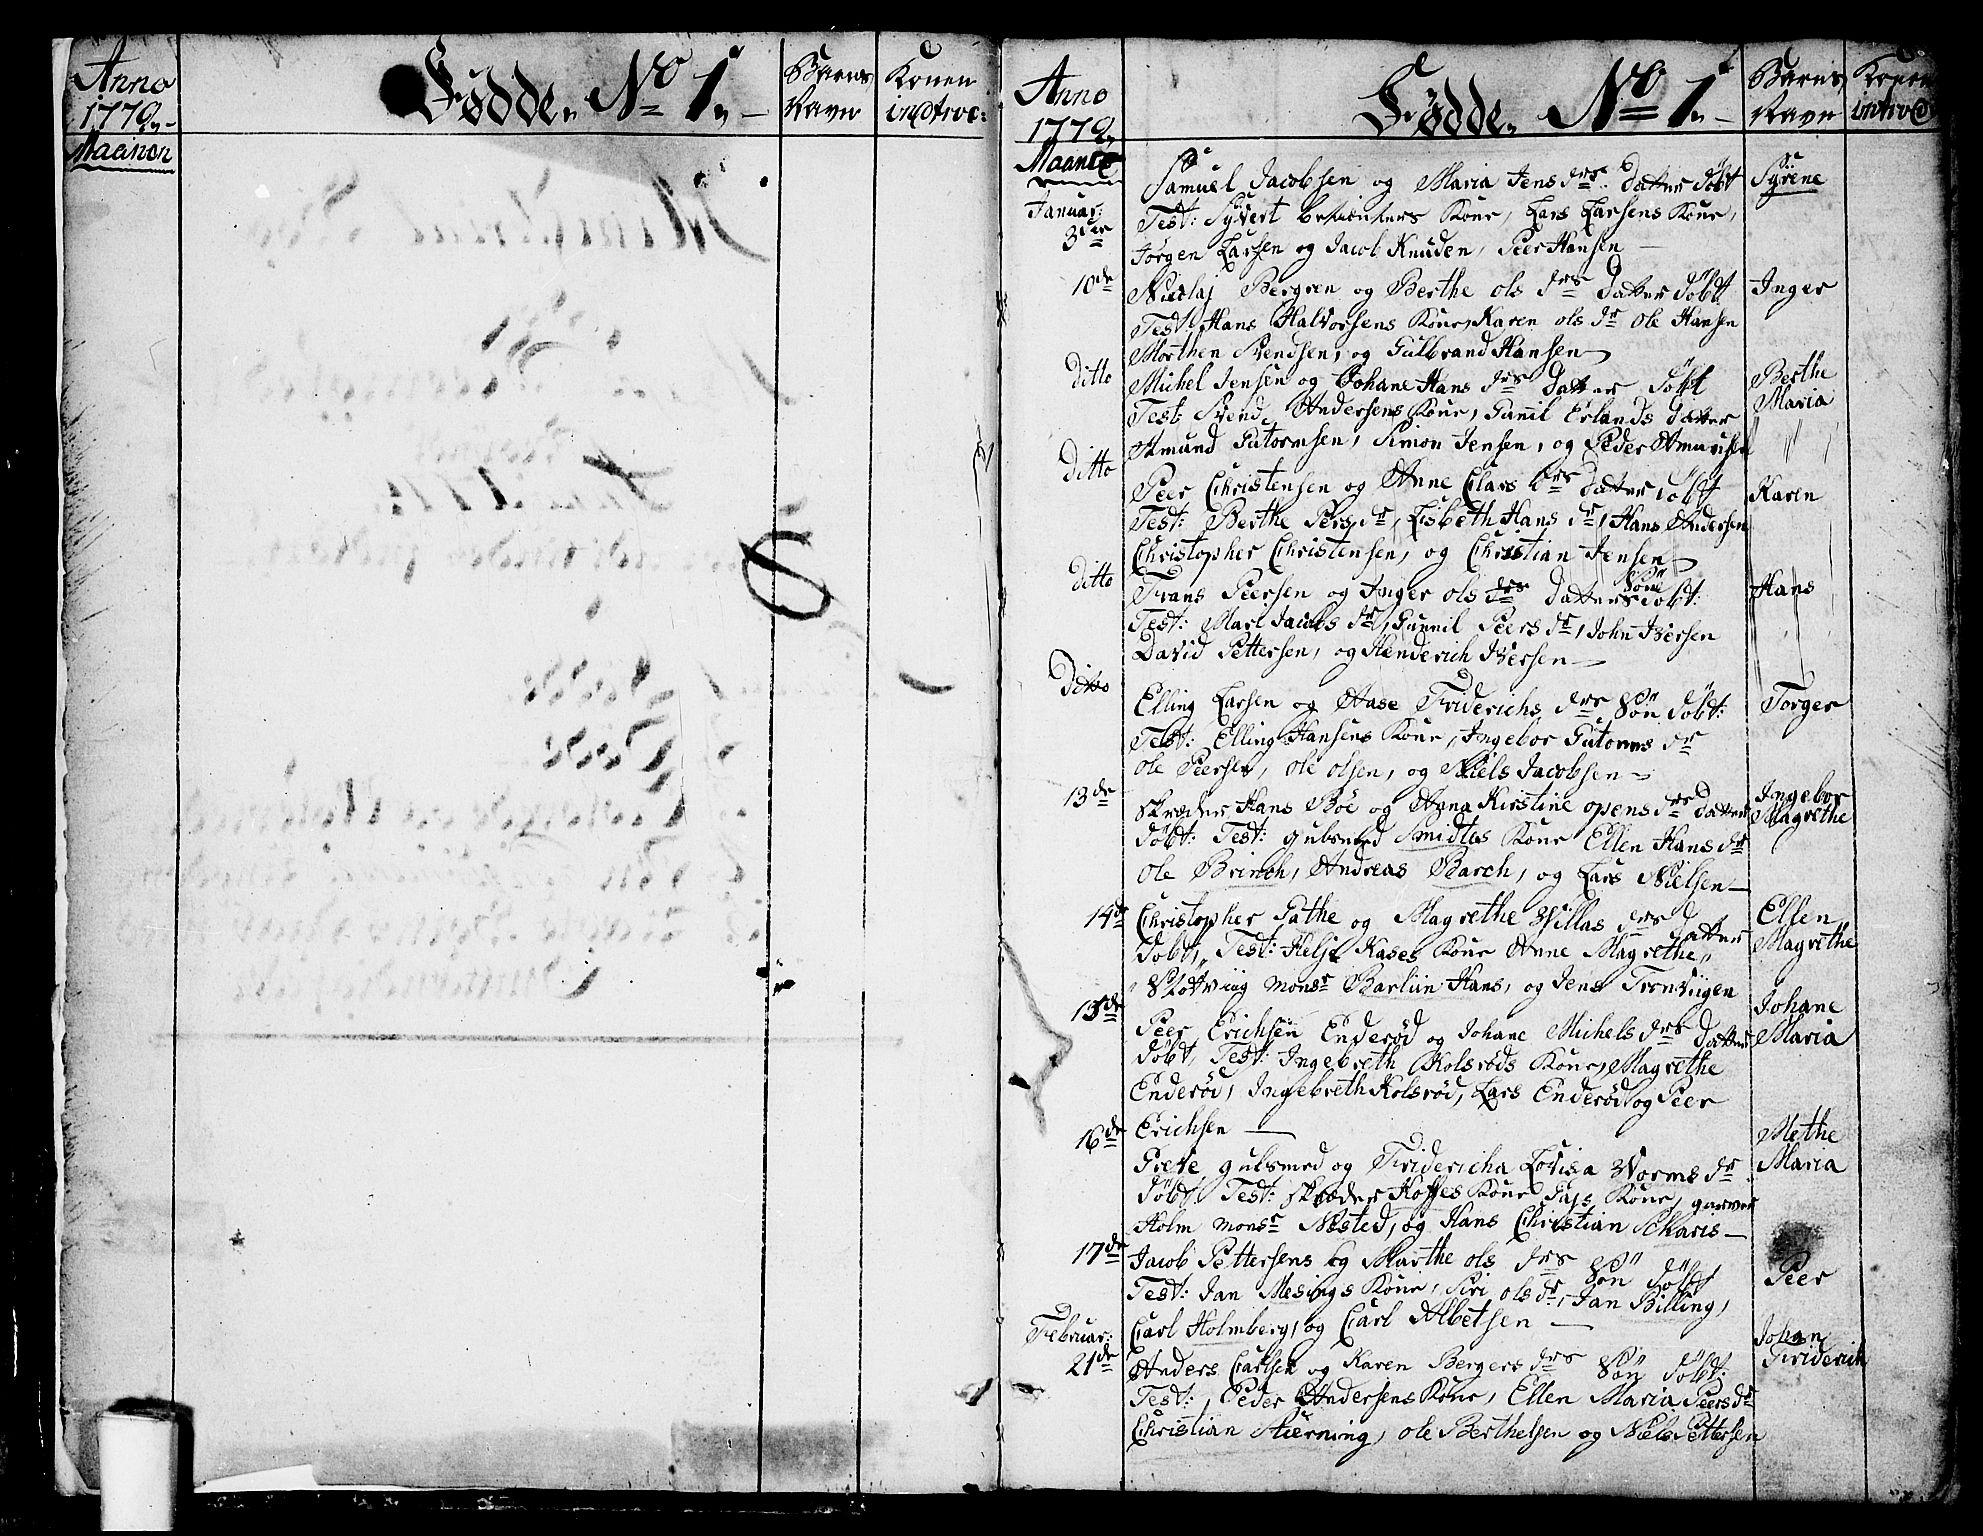 SAO, Moss prestekontor Kirkebøker, F/Fa/Faa/L0003: Ministerialbok nr. I 3, 1779-1814, s. 0-1